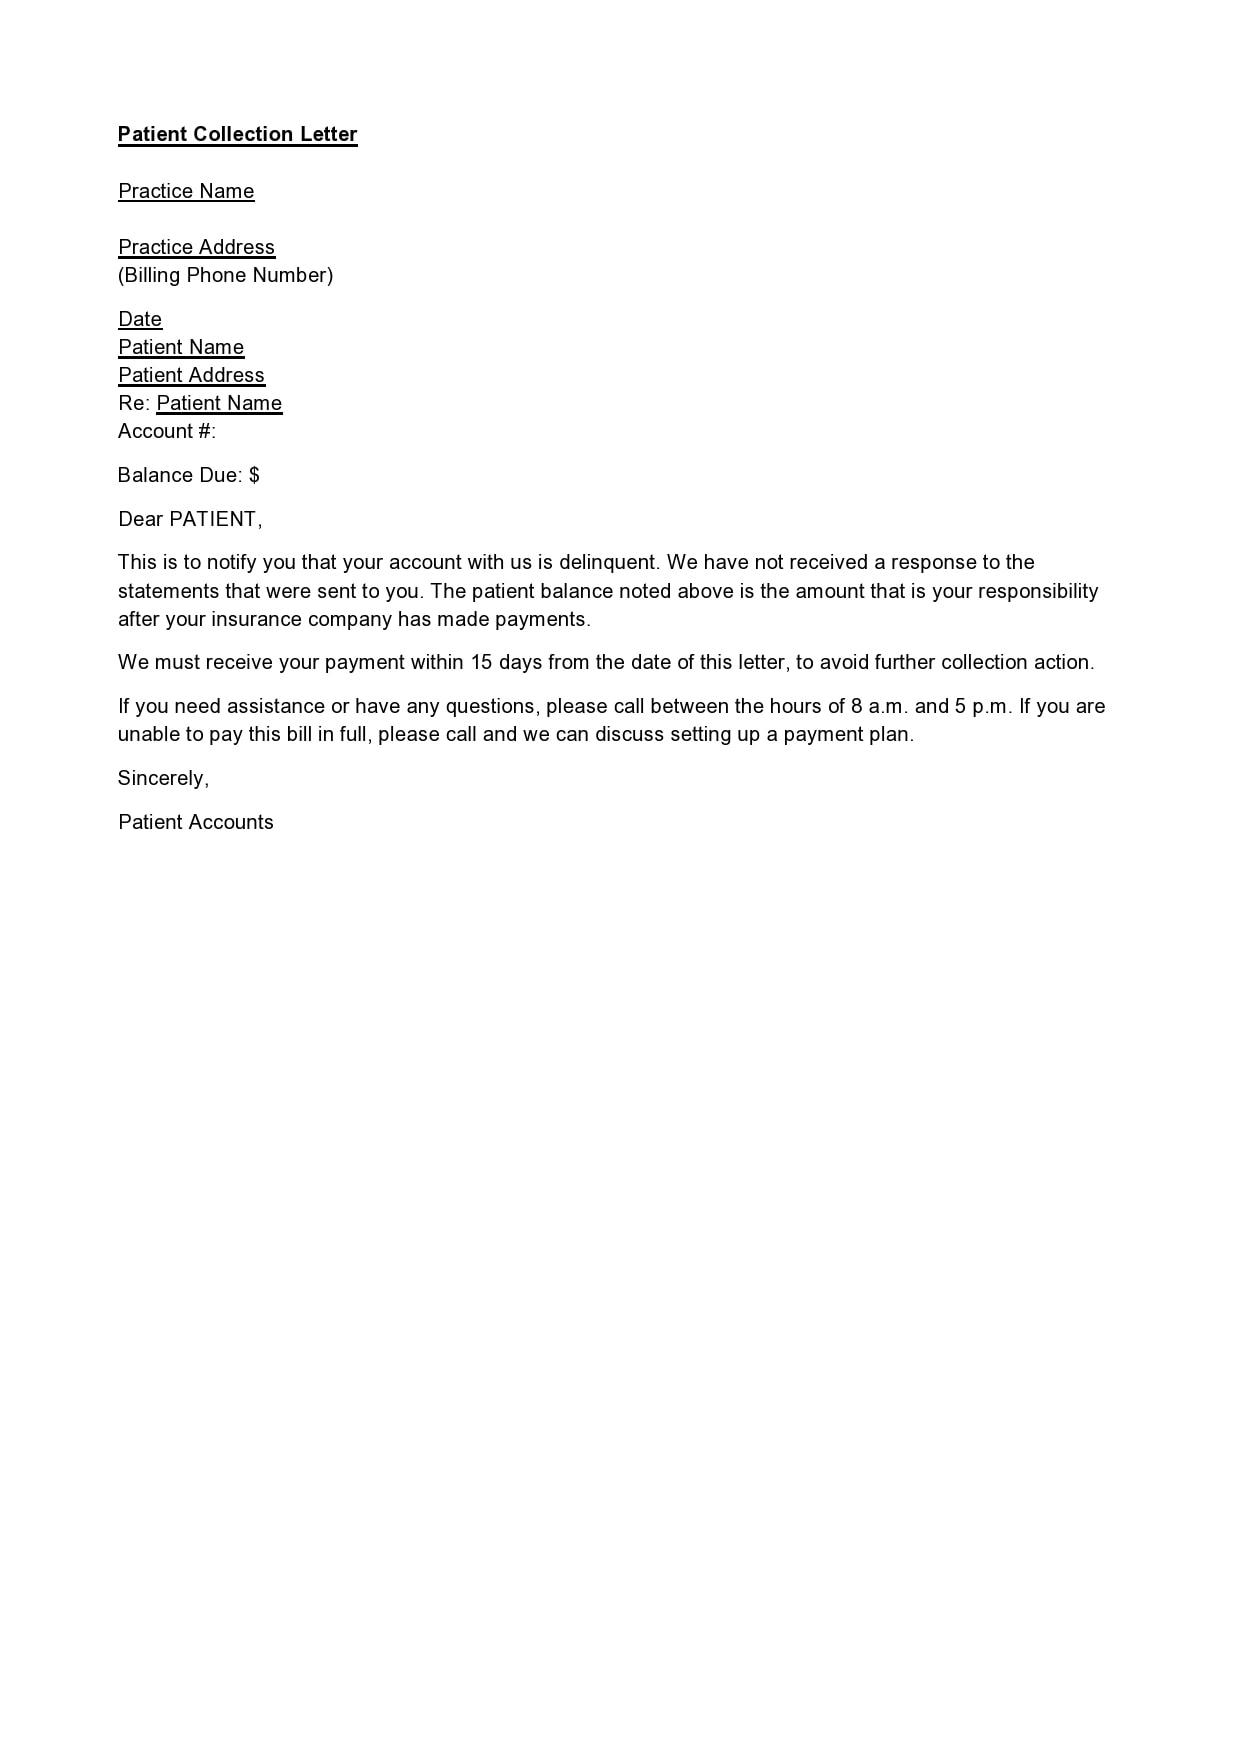 30 Best Debt Collection Letter Templates   TemplateArchive